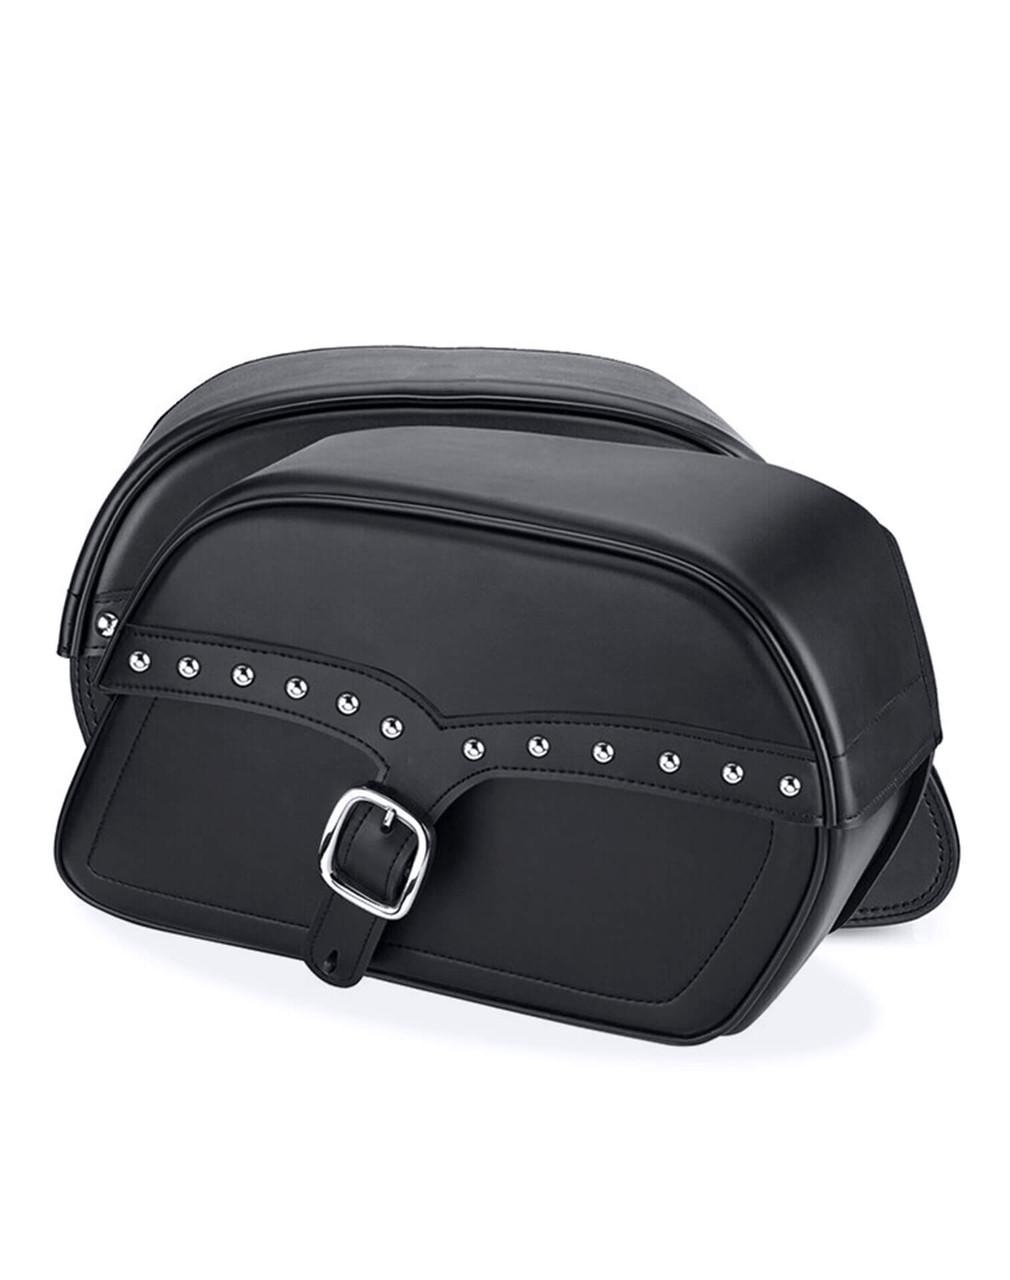 Suzuki Intruder 1500 VL1500 SS Slanted Studded Large Motorcycle Saddlebags Both Bags View